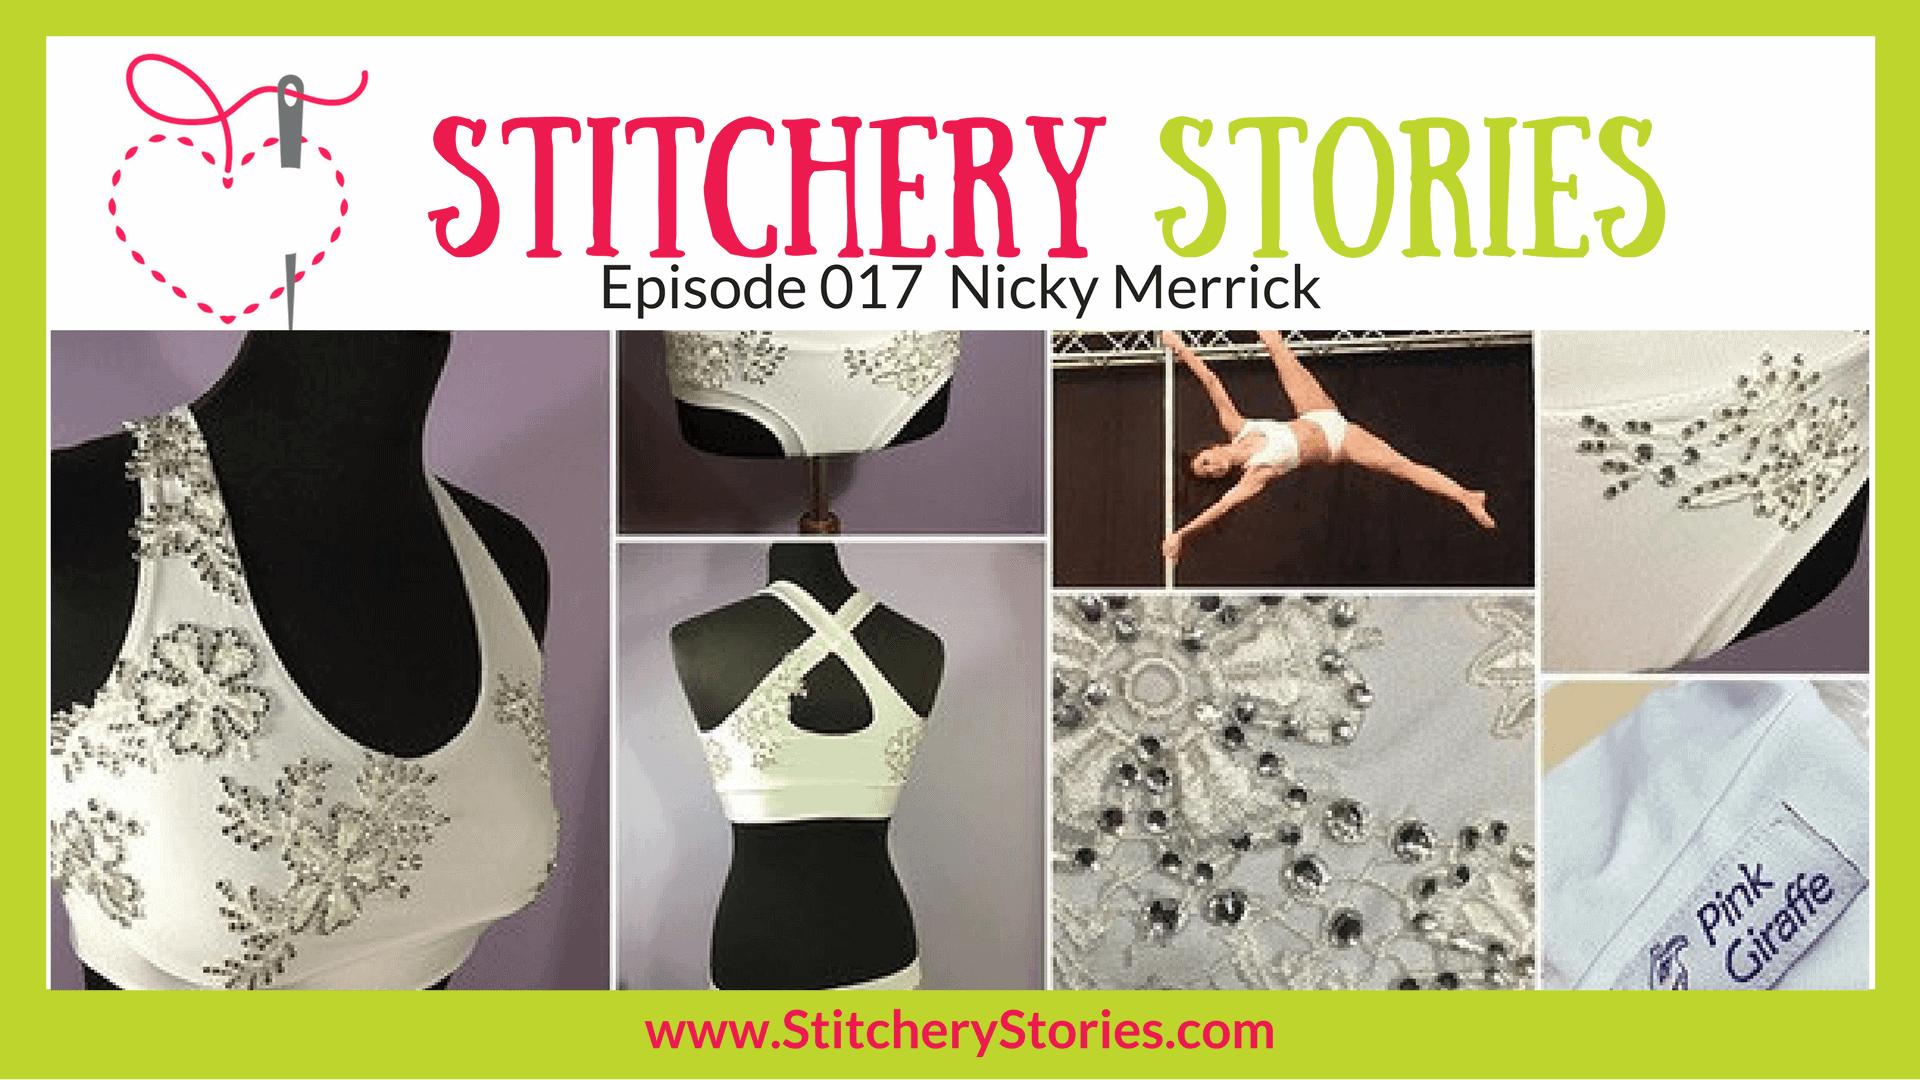 Nicky Merrick Stitchery Stories Textile Art Podcast Wide Art